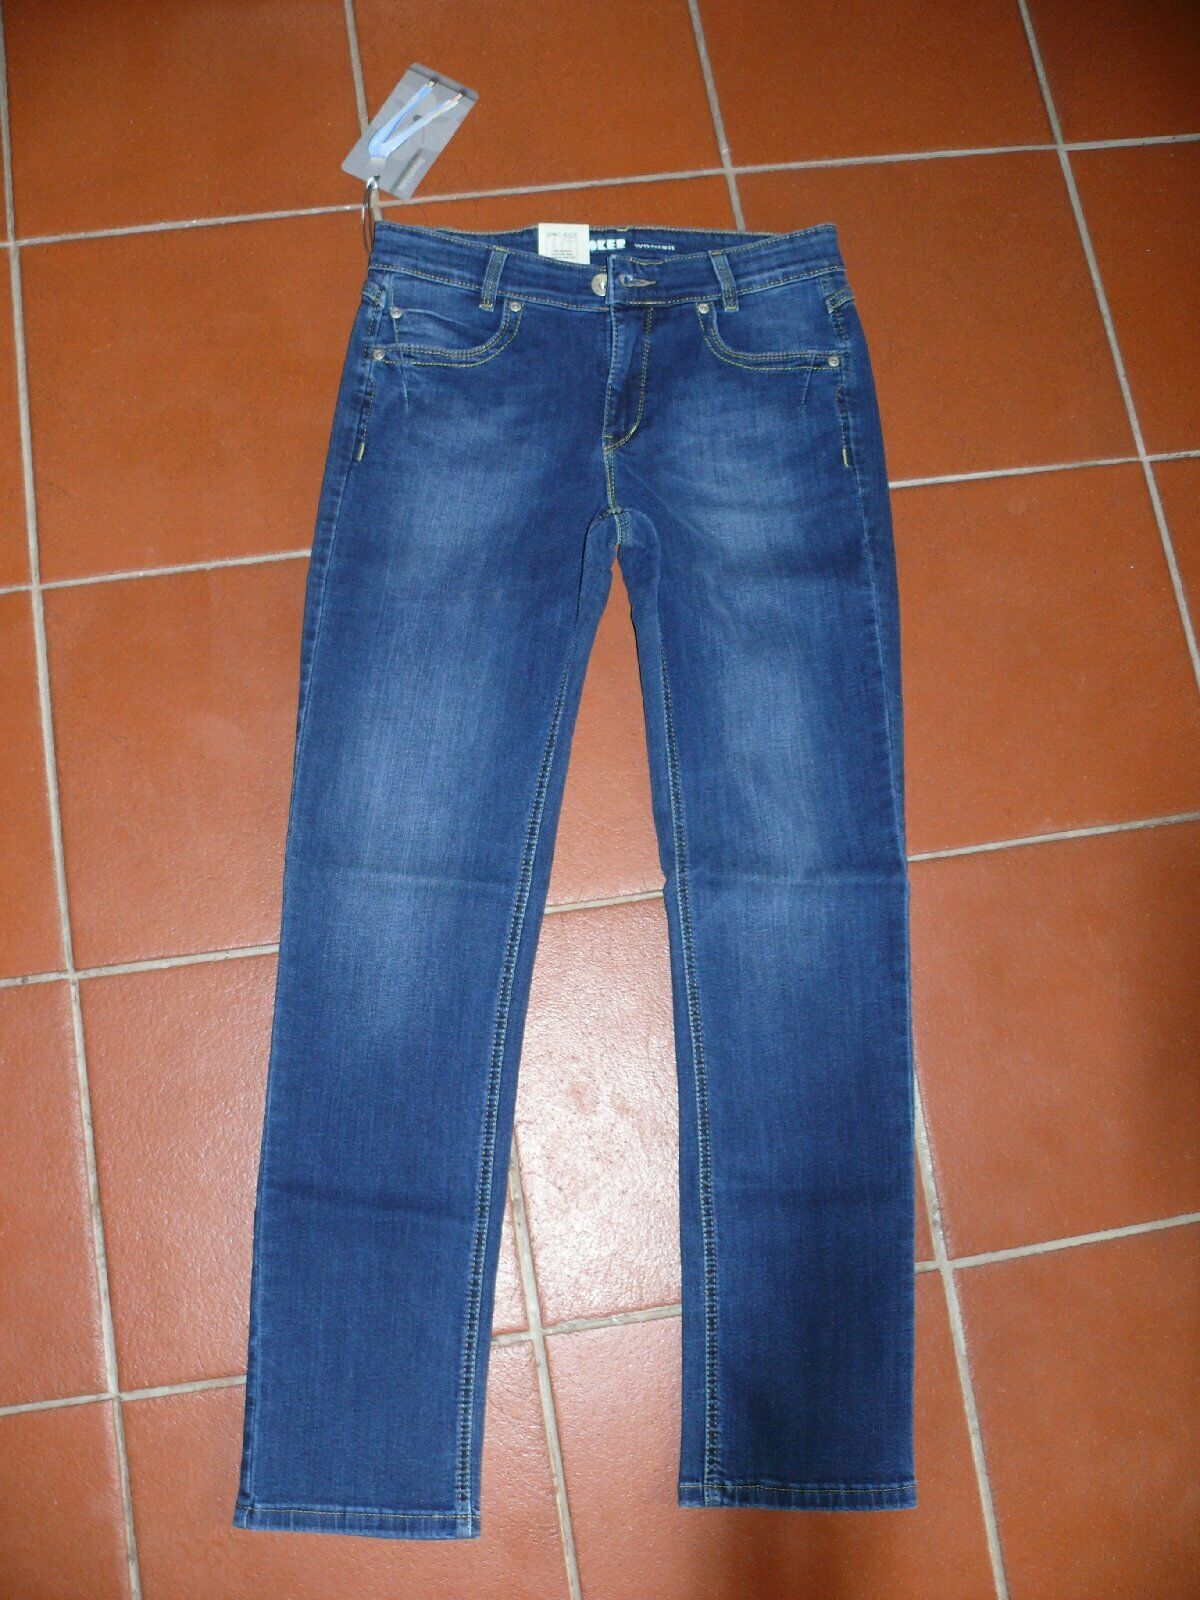 JOKER Röhrenjeans Jeans MARLENY straight leg 4738 67 dunkelblue W31 L32 42 NEU